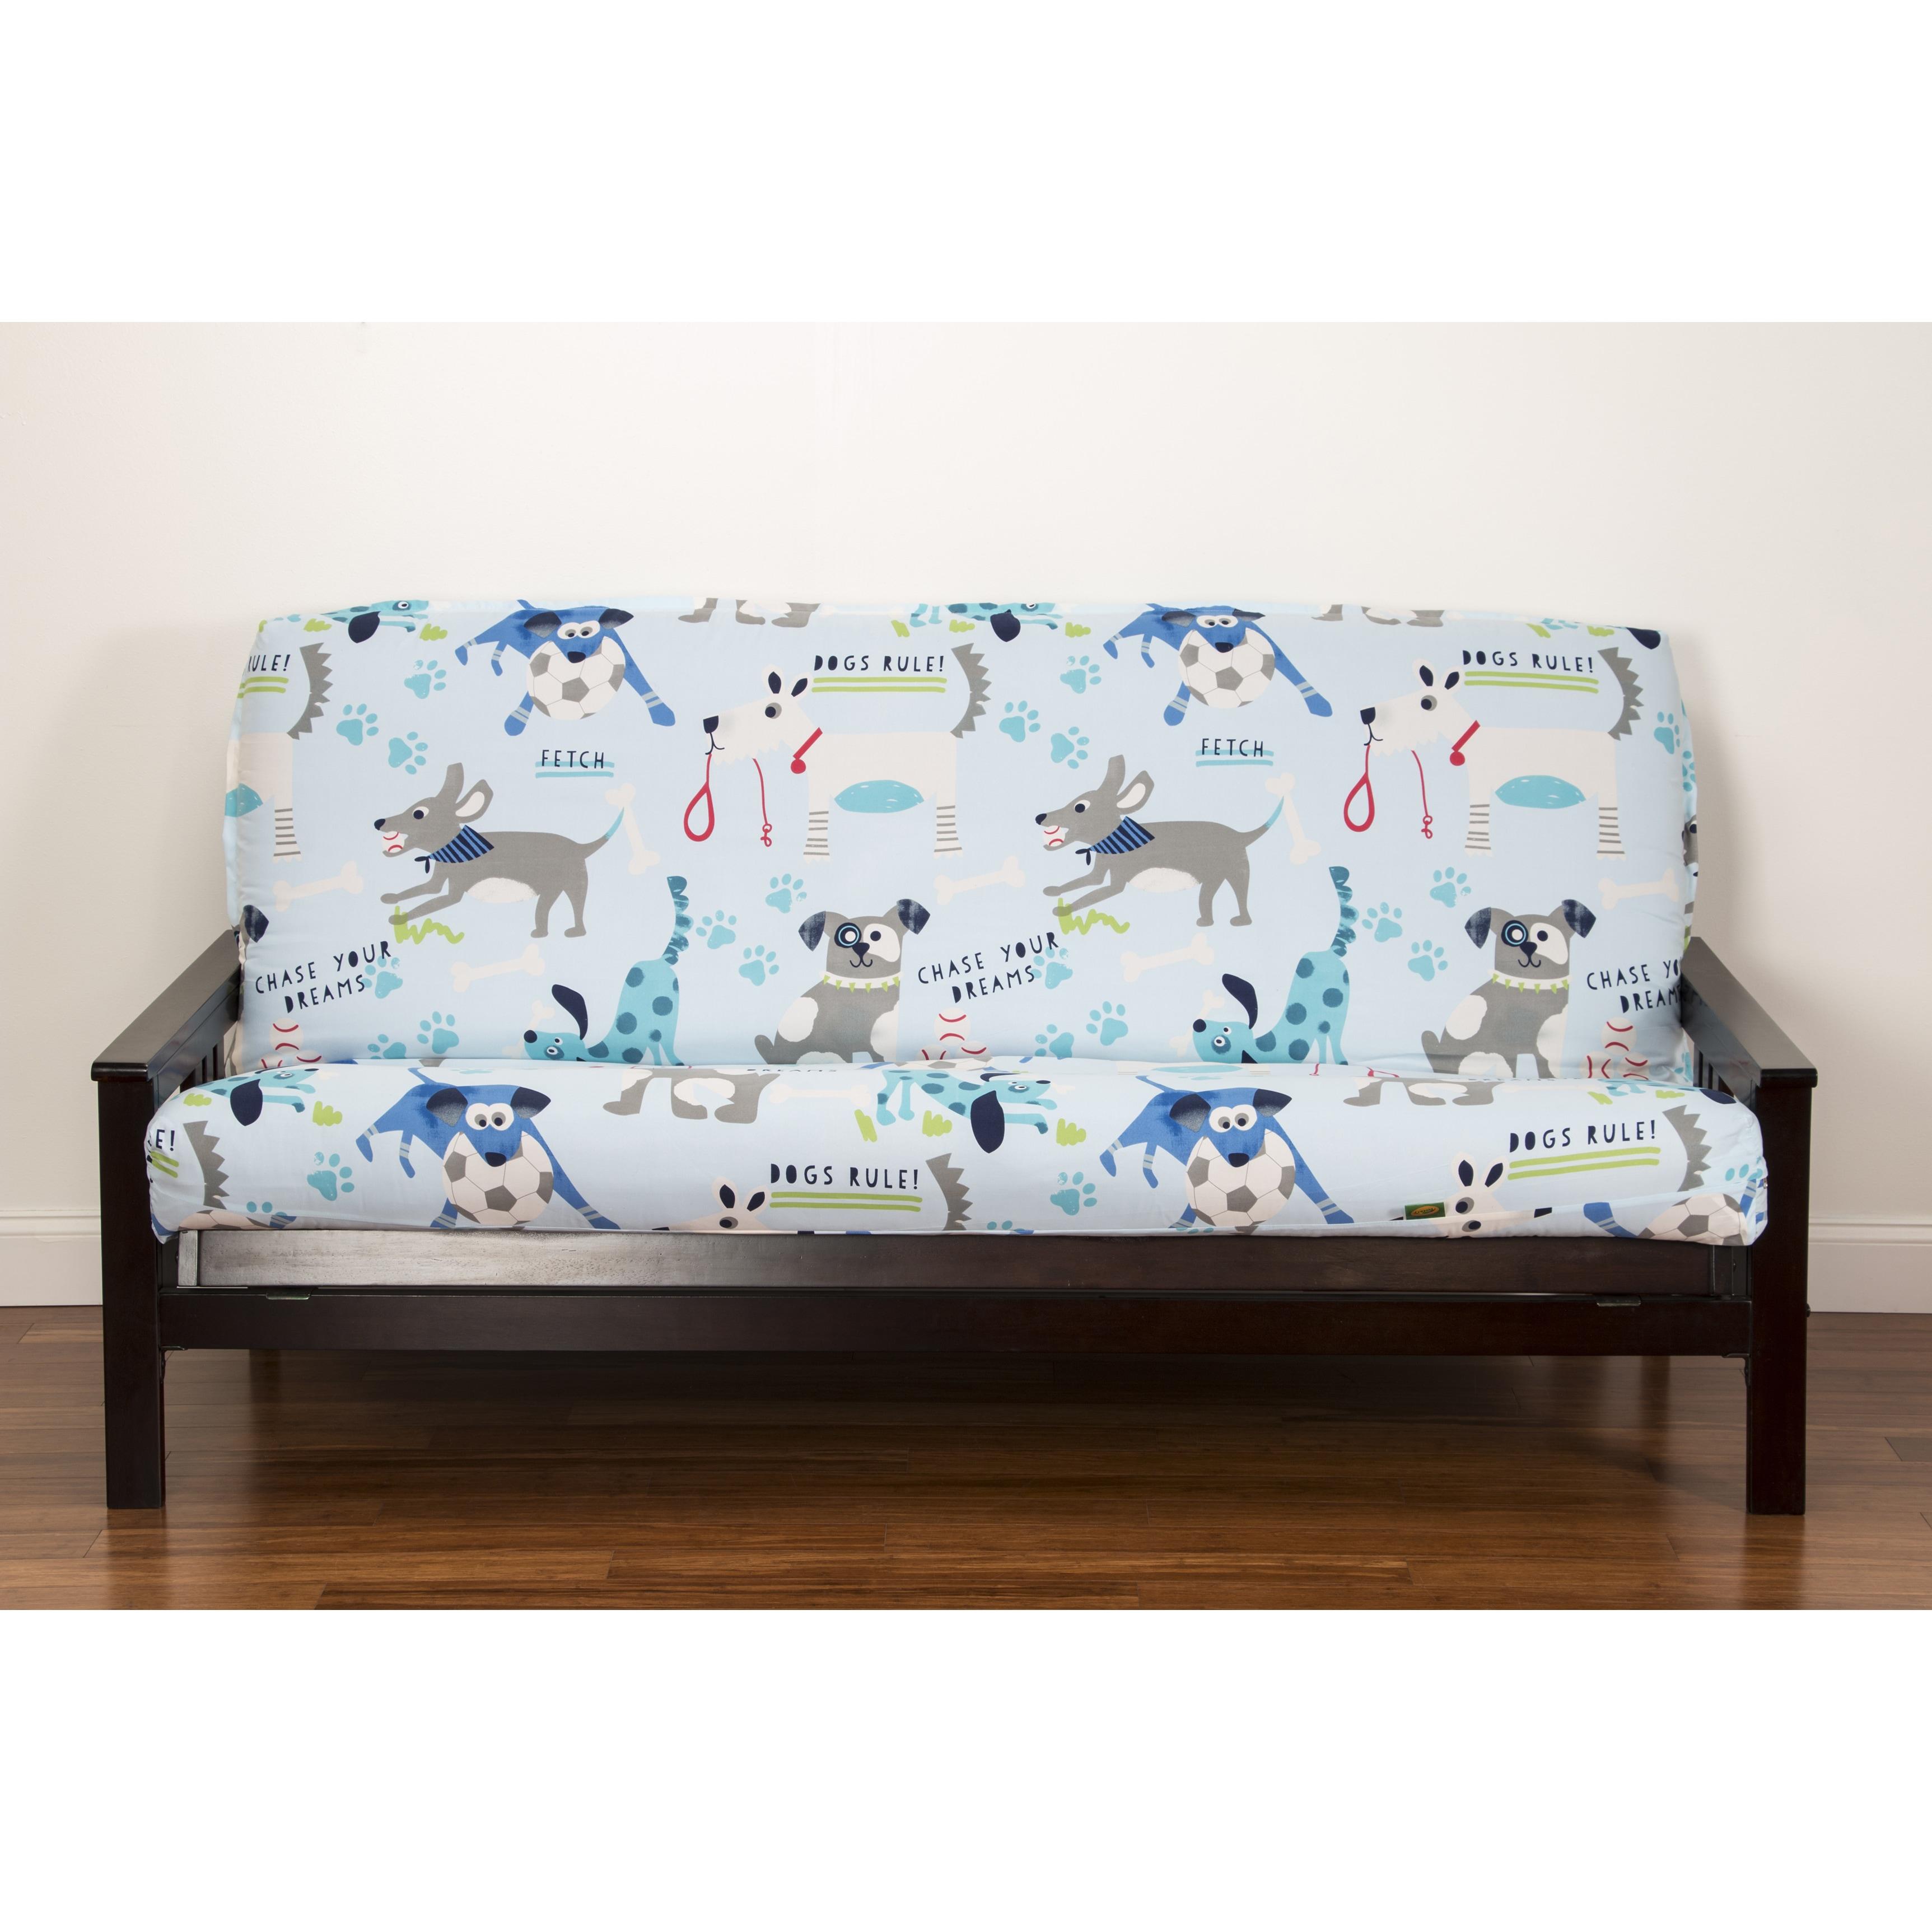 Remarkable Crayola Chase Your Dreams Futon Cover Inzonedesignstudio Interior Chair Design Inzonedesignstudiocom